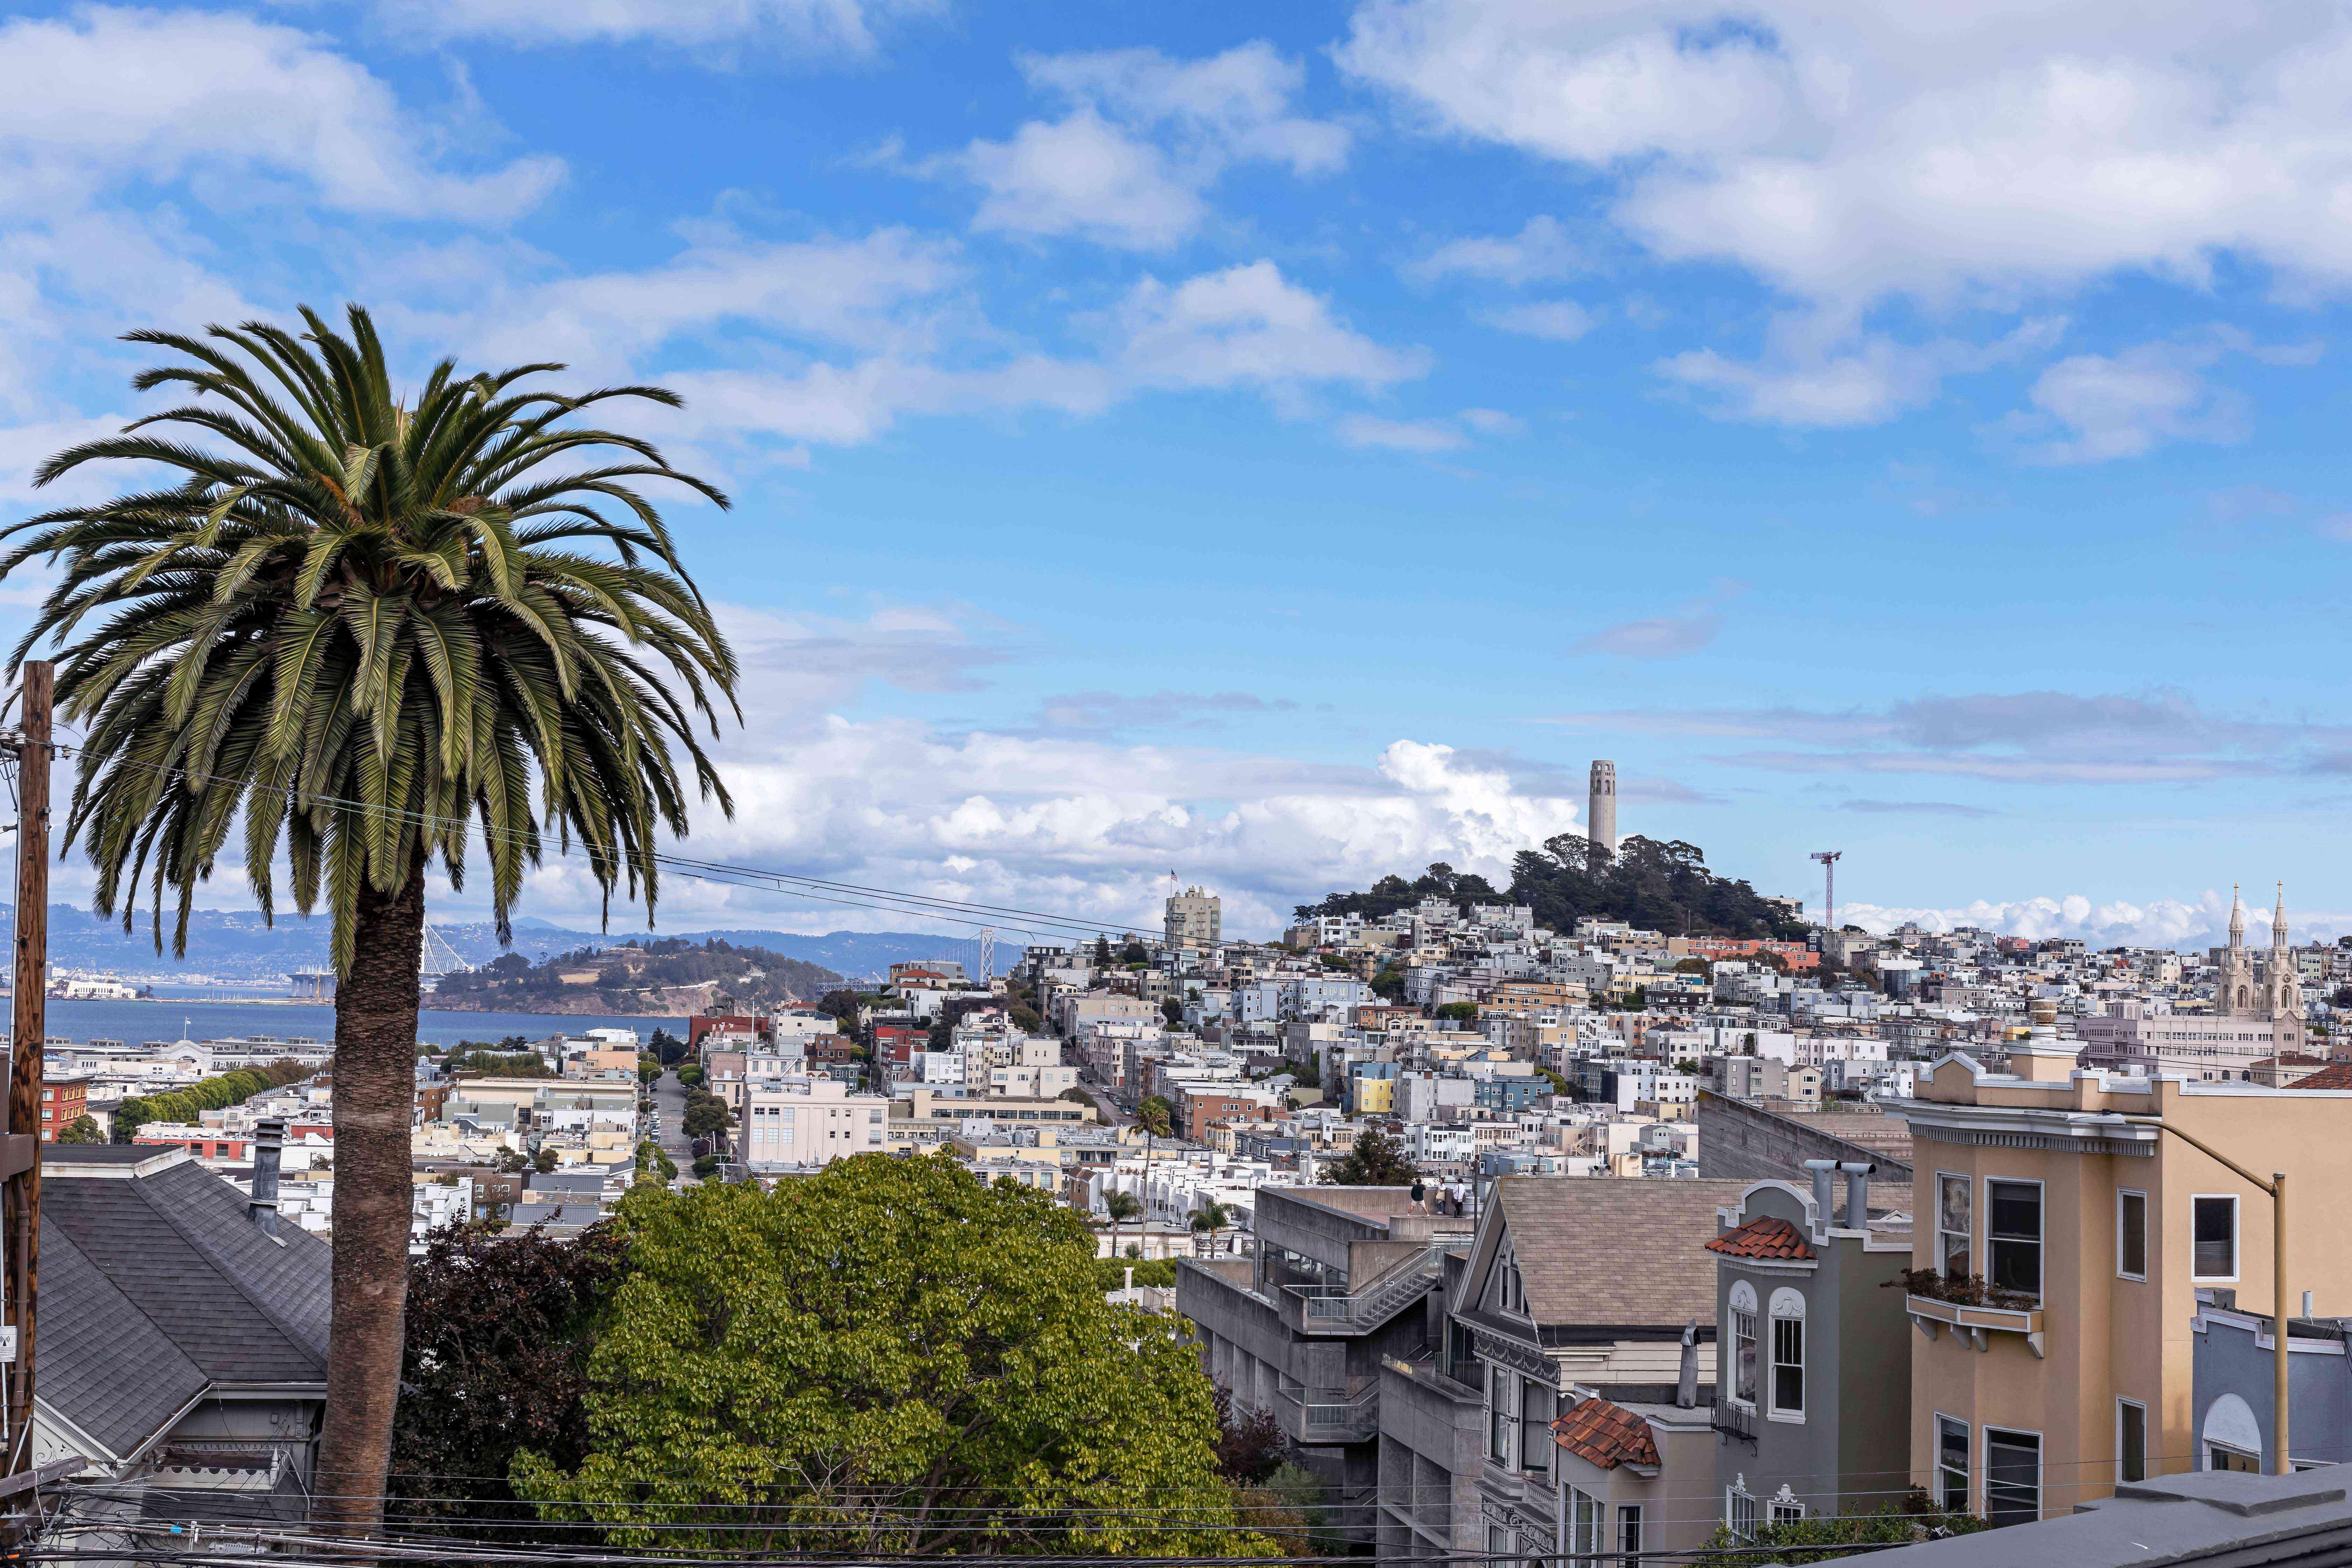 Coit Tower, Telegraph Hill, San Francisco